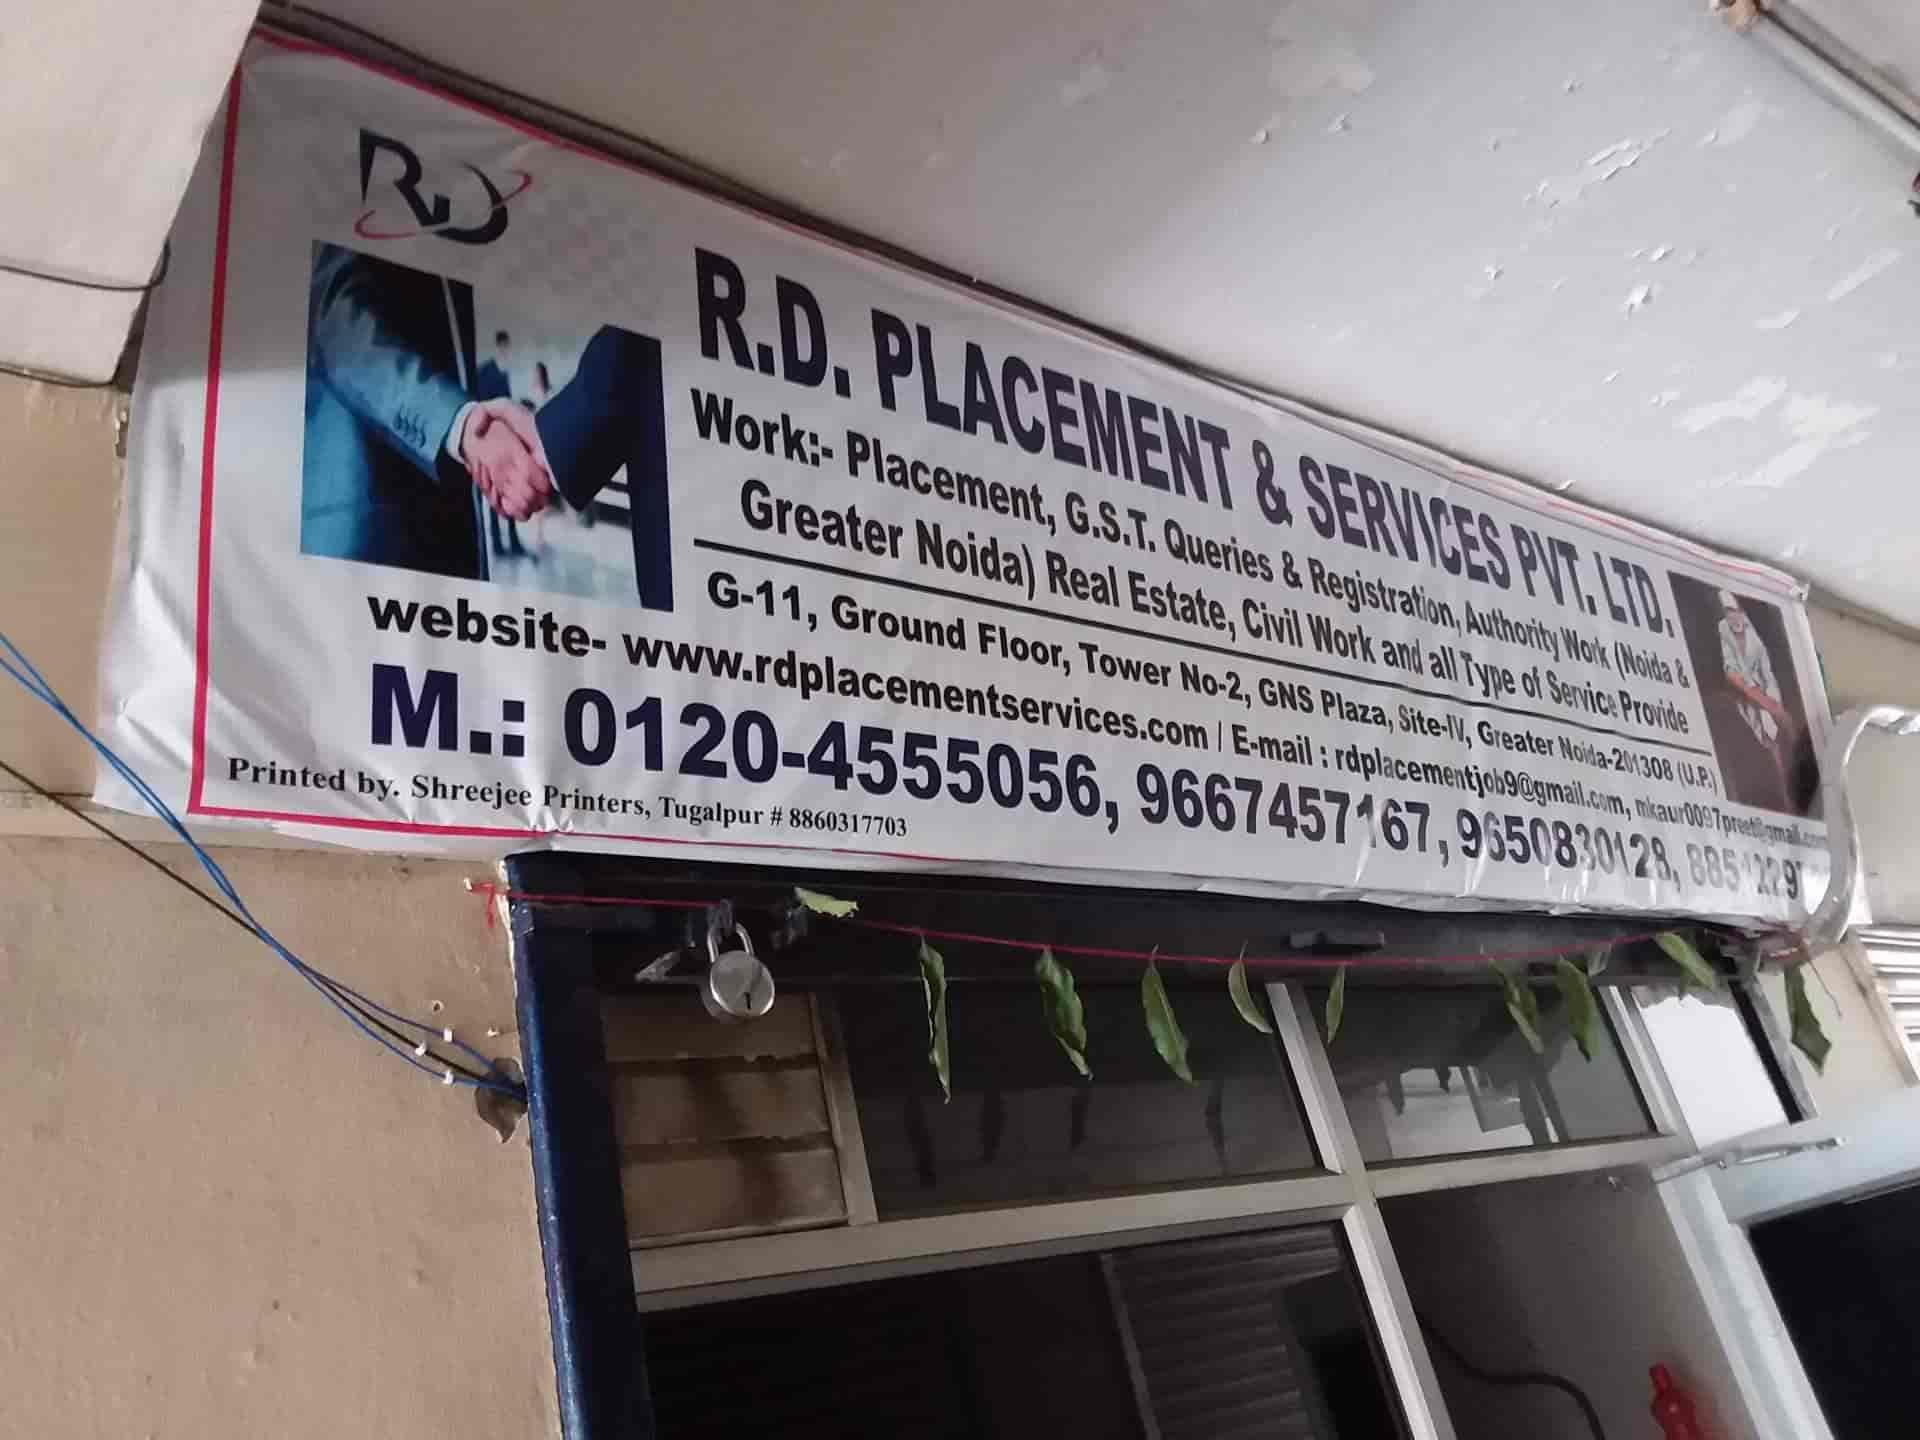 R d  Placement & Service Pvt Ltd , Greater - Placement